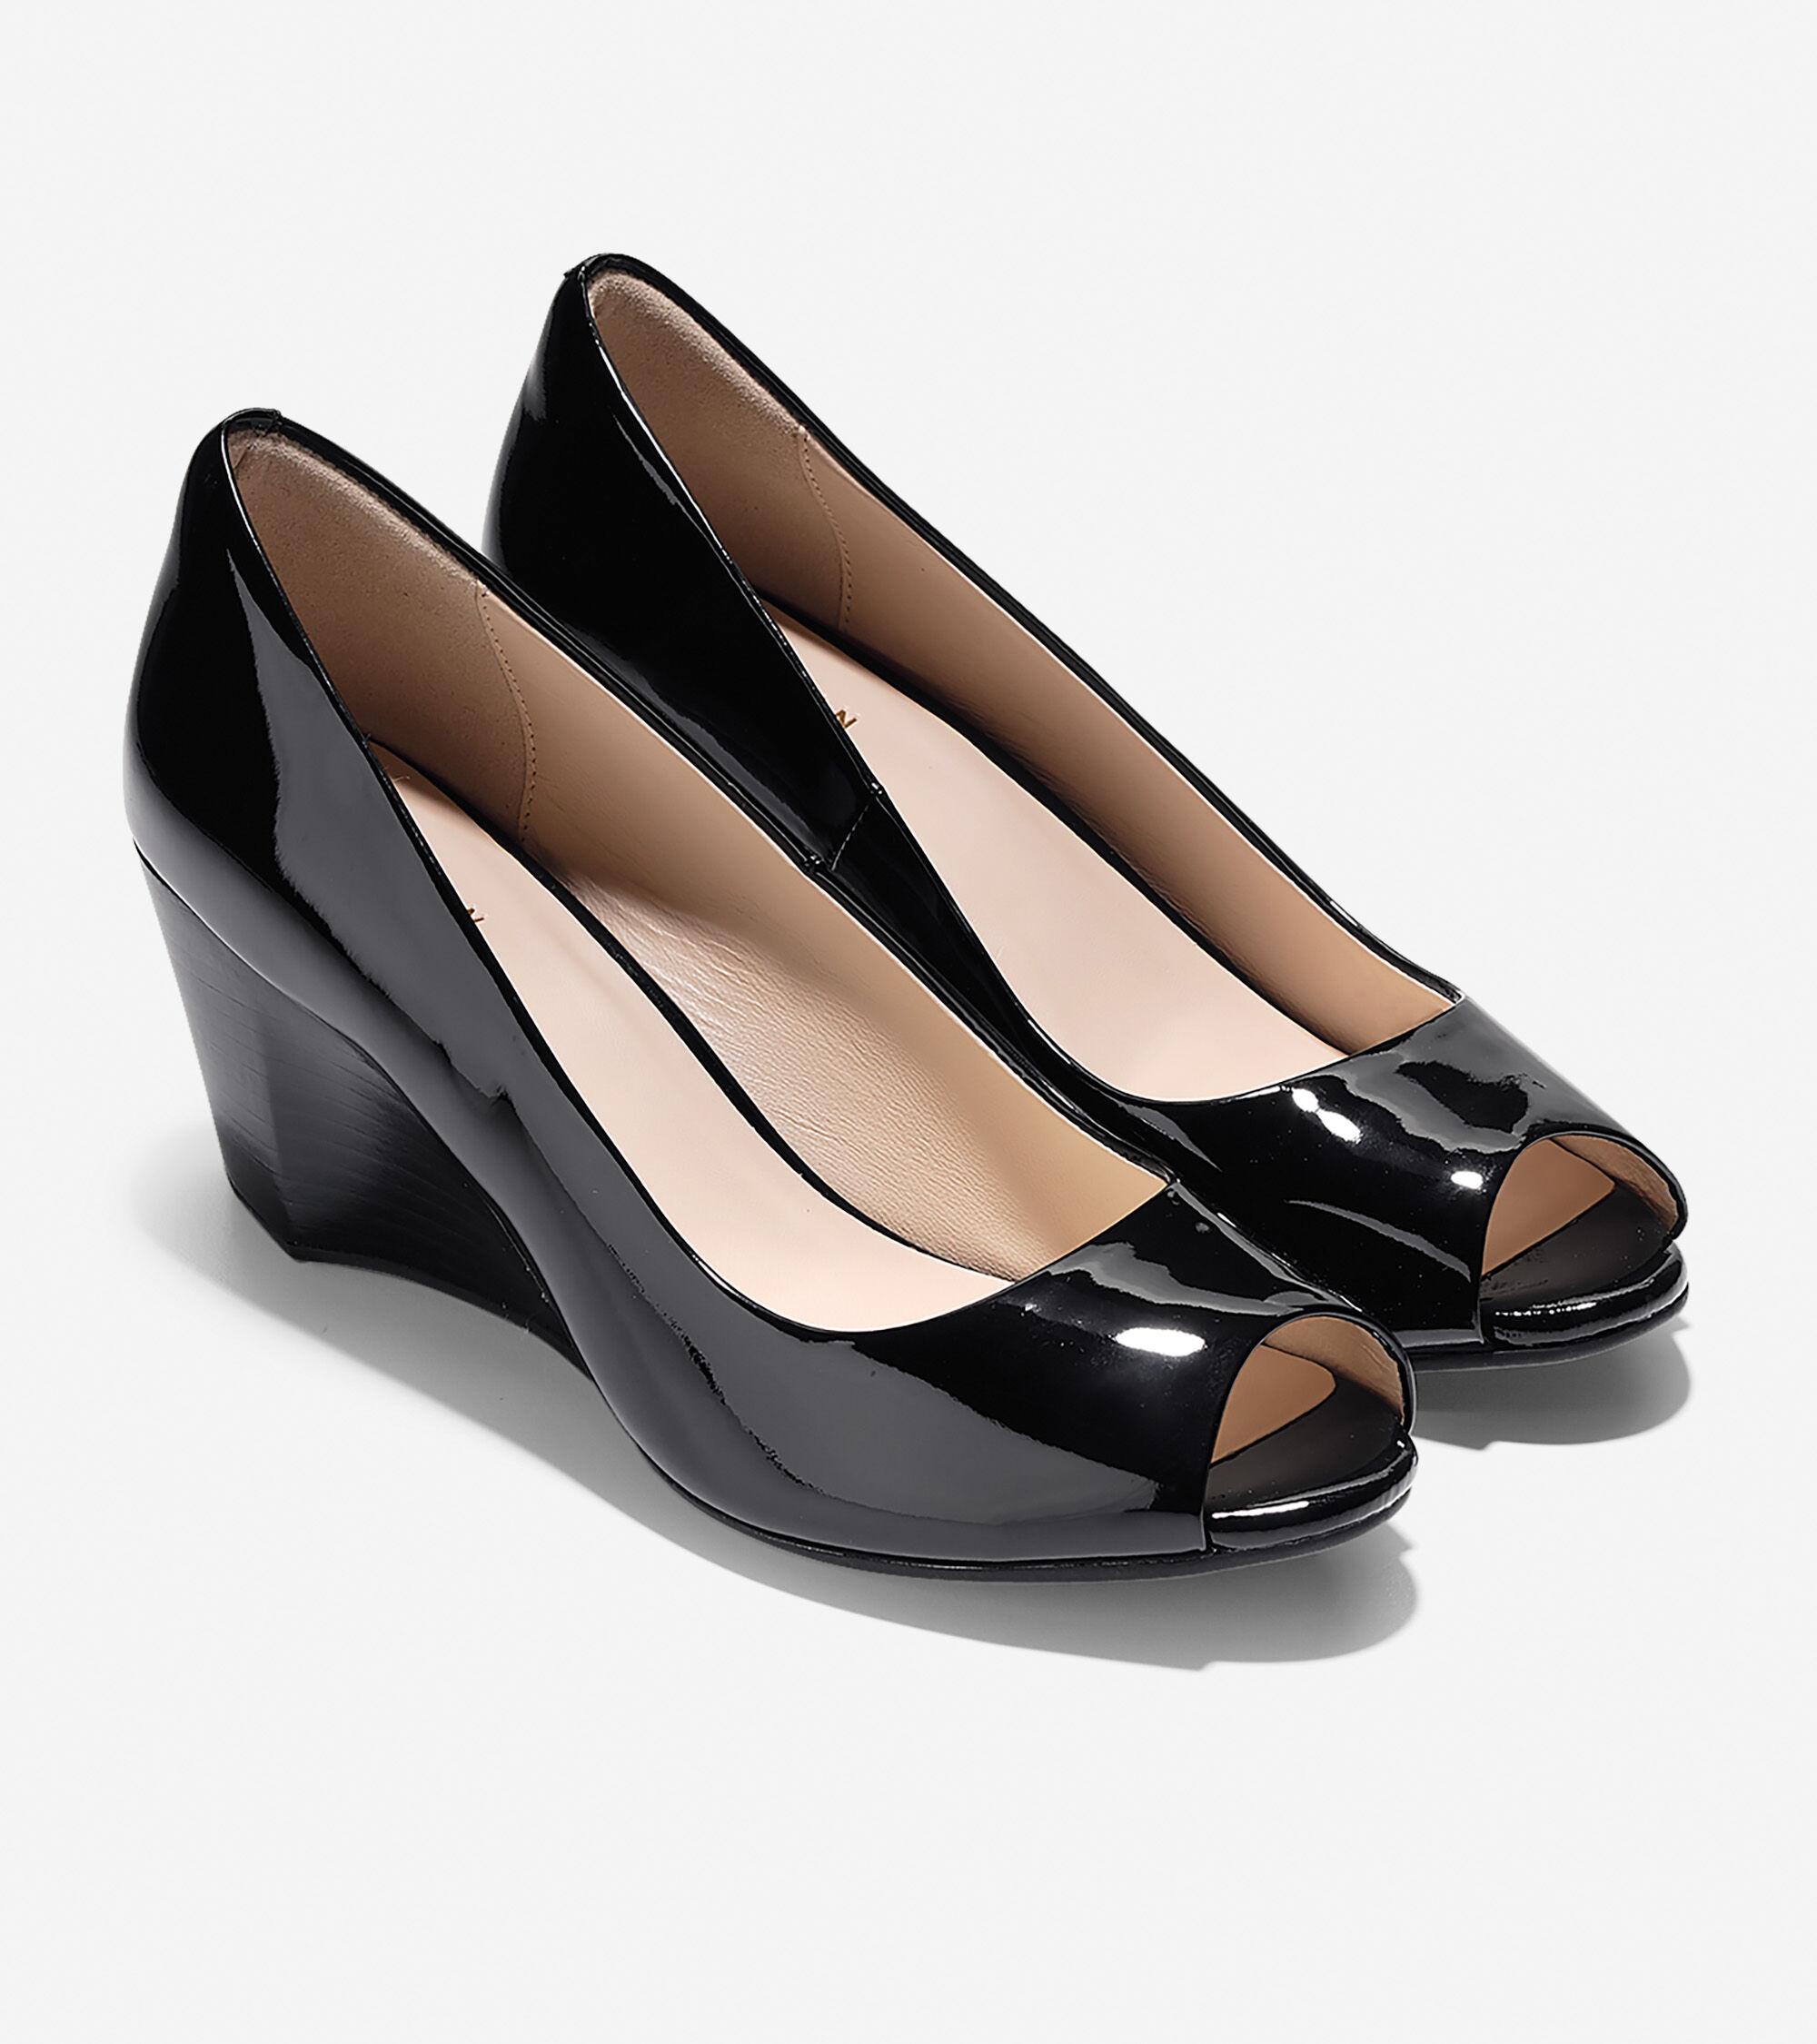 4af6afa6d3dc Women s Sadie Open Toe Wedges 65mm in Black